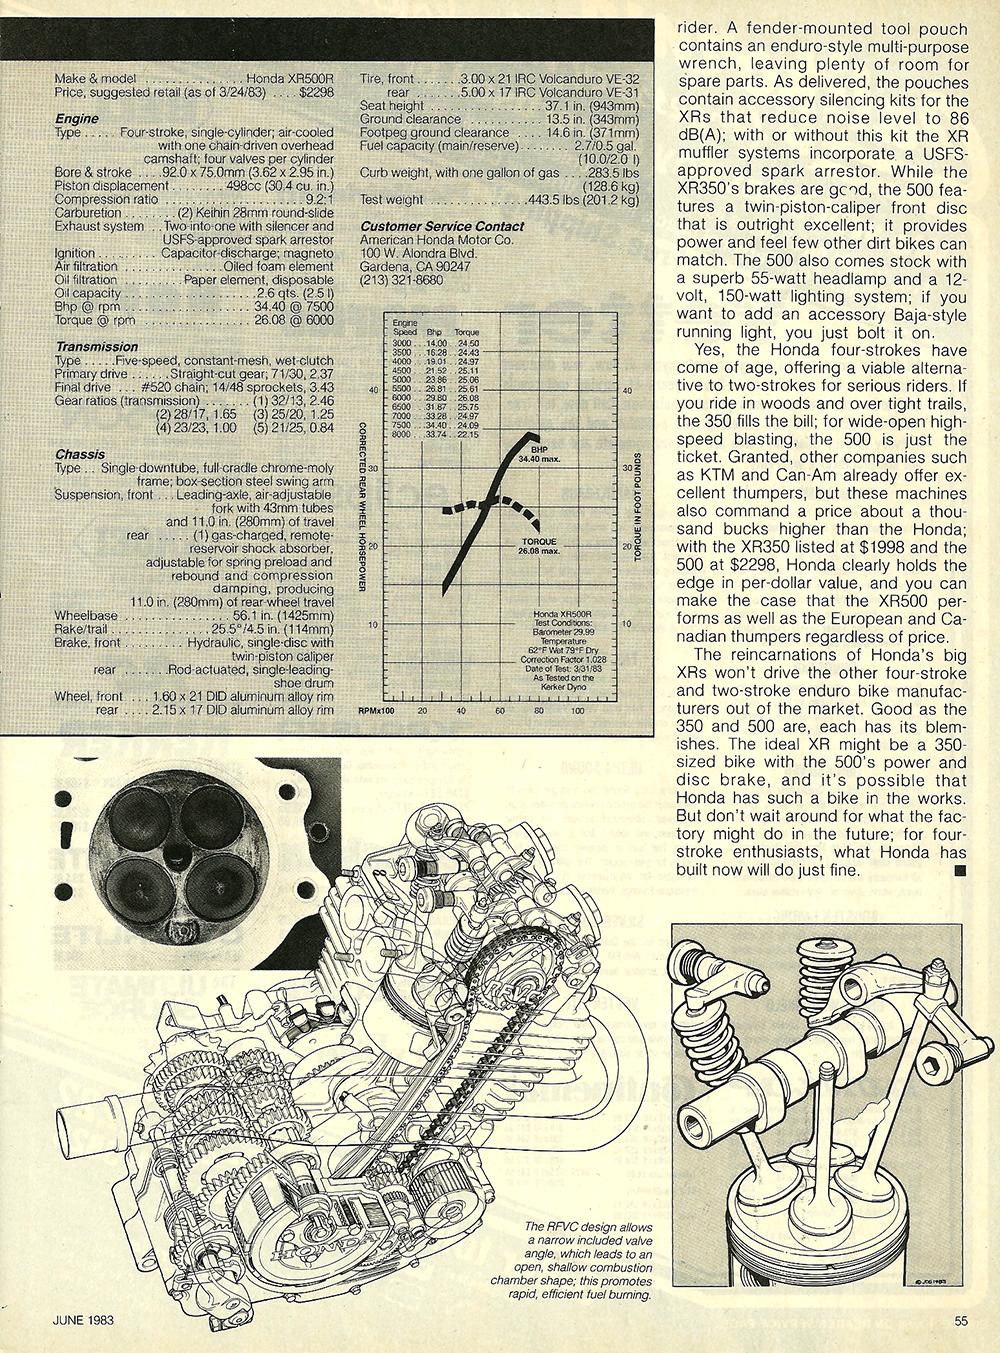 1983 Honda XR350R XR500R road test 8.jpg